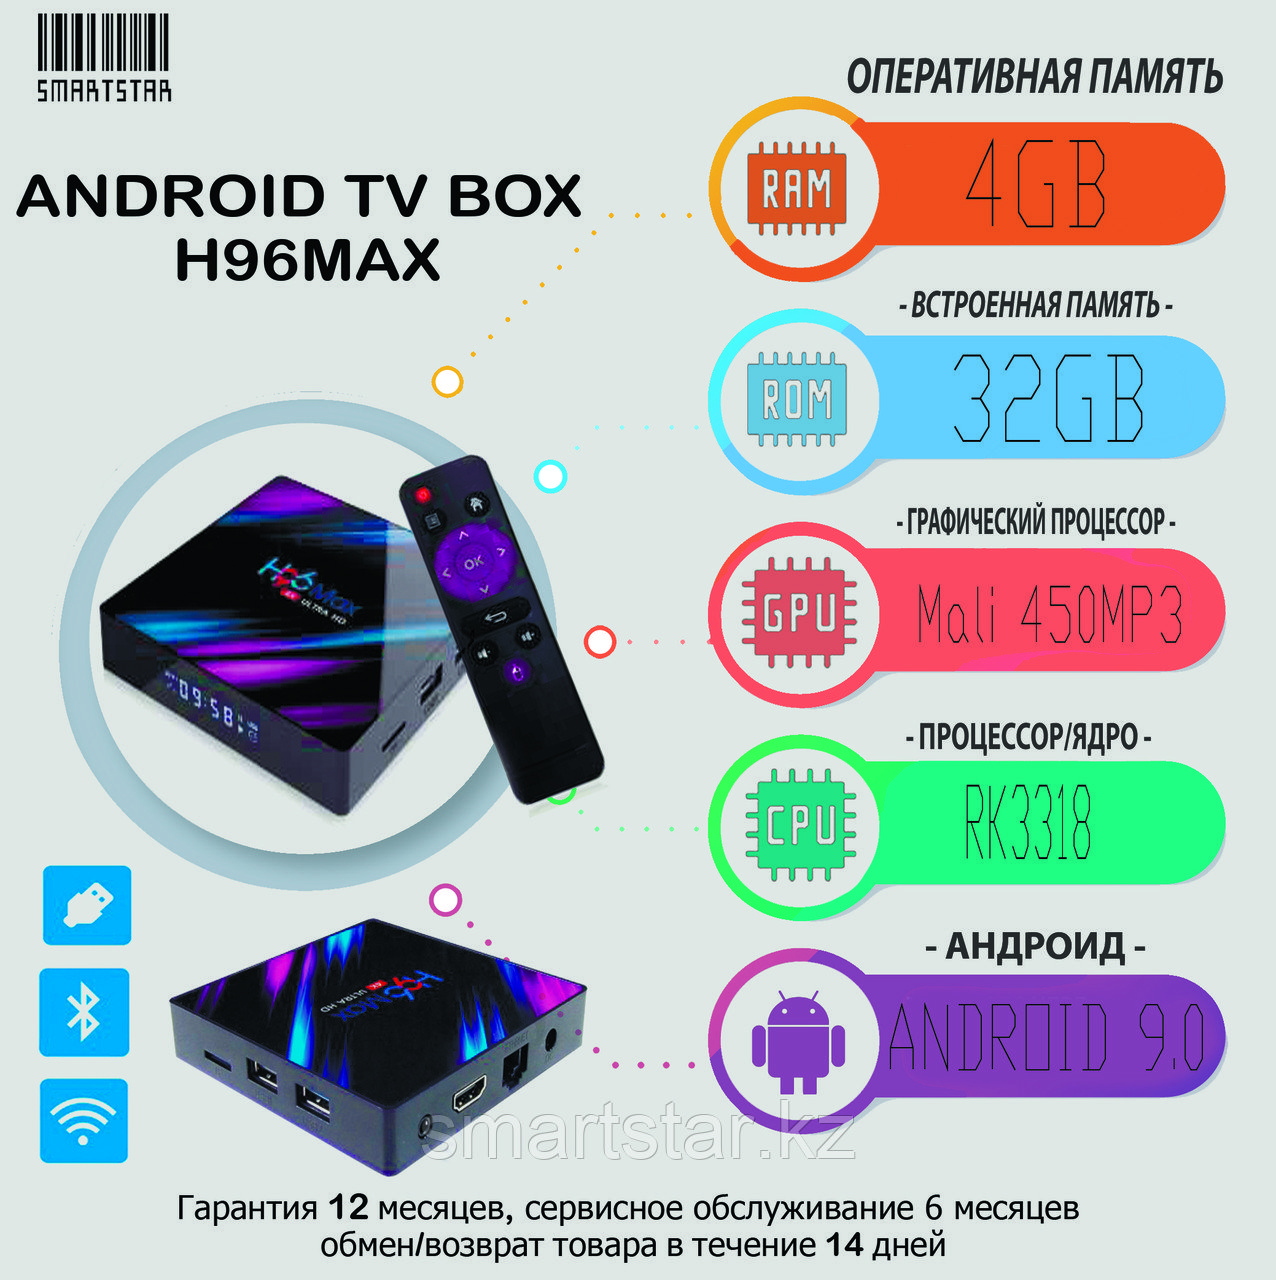 ANDROID TV BOX приставка - H96 MAX (4/32GB)